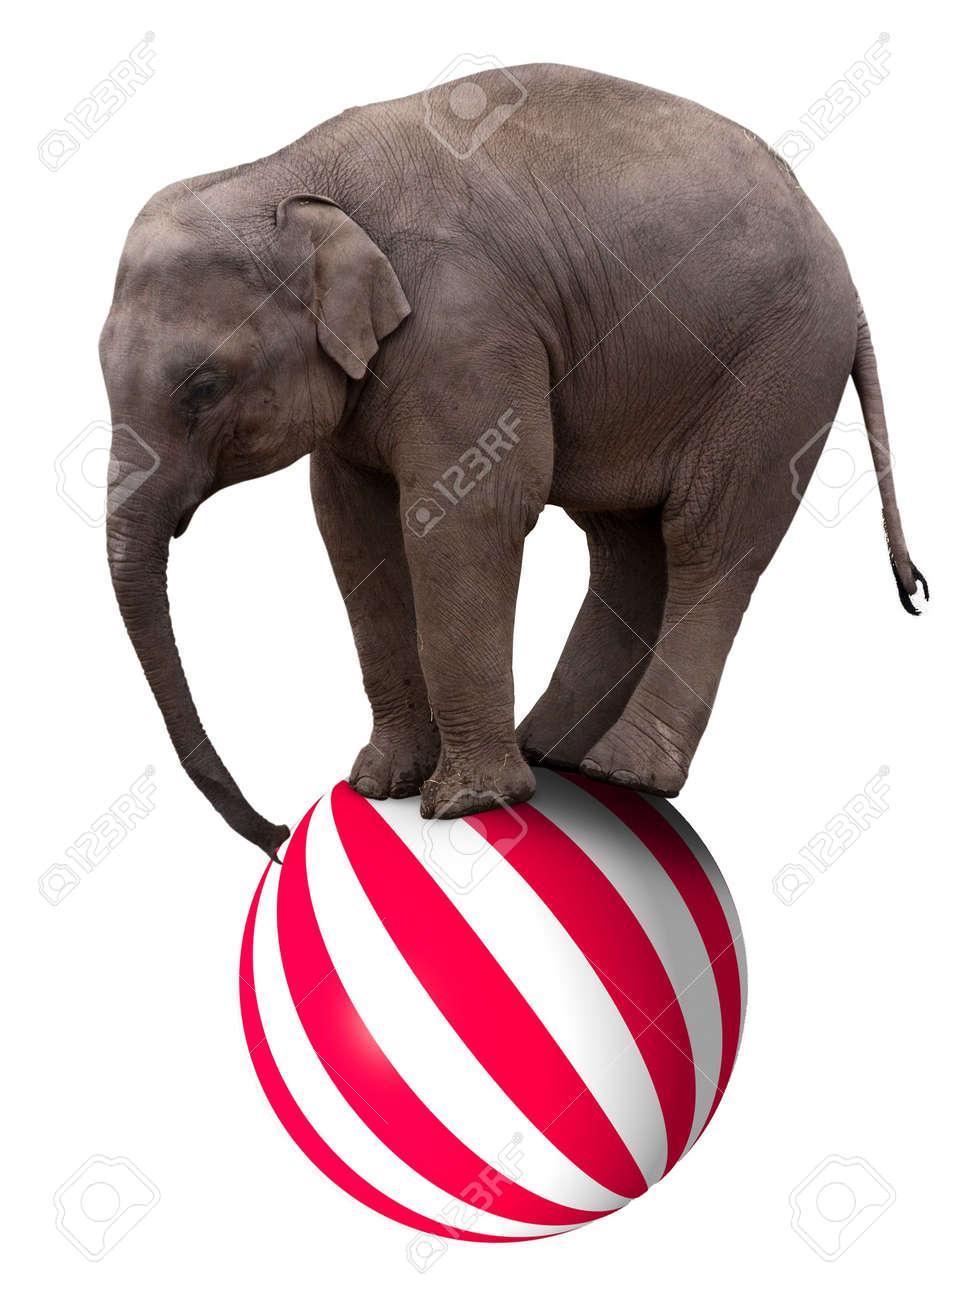 A baby circus elephant balancing on a big ball Stock Photo - 4088237